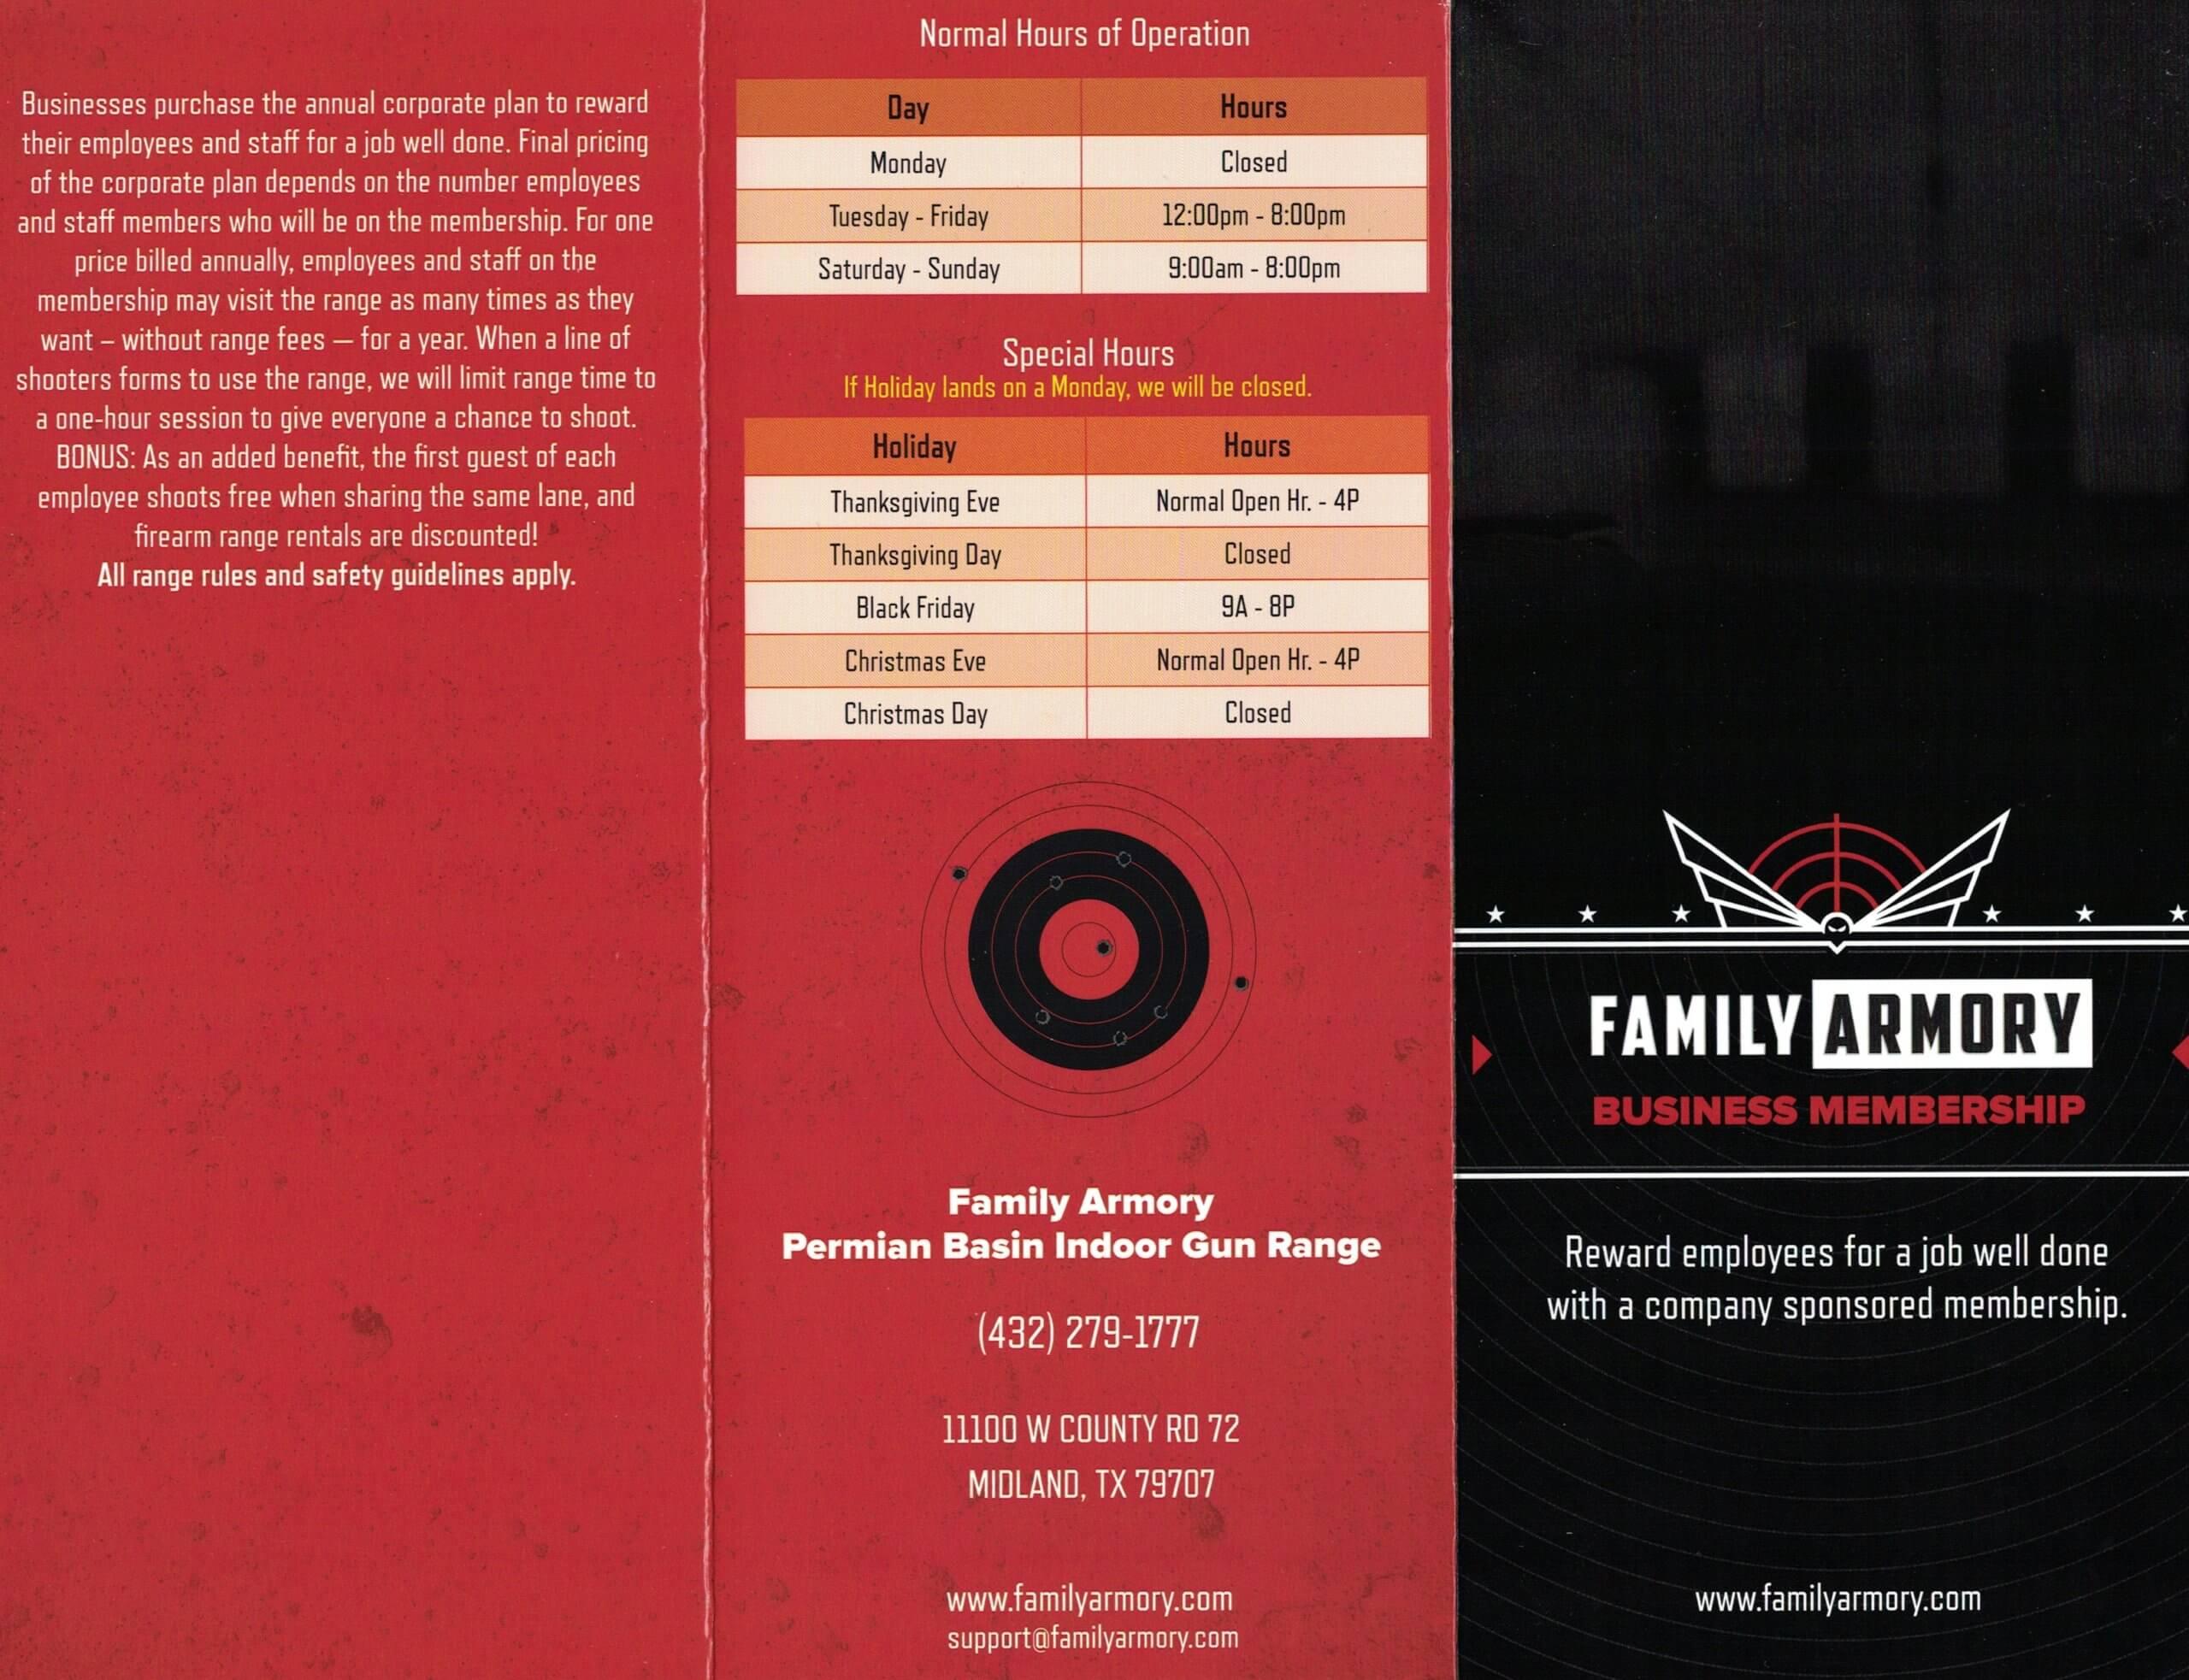 Family Armory Corporate Membership Brochure Exterior